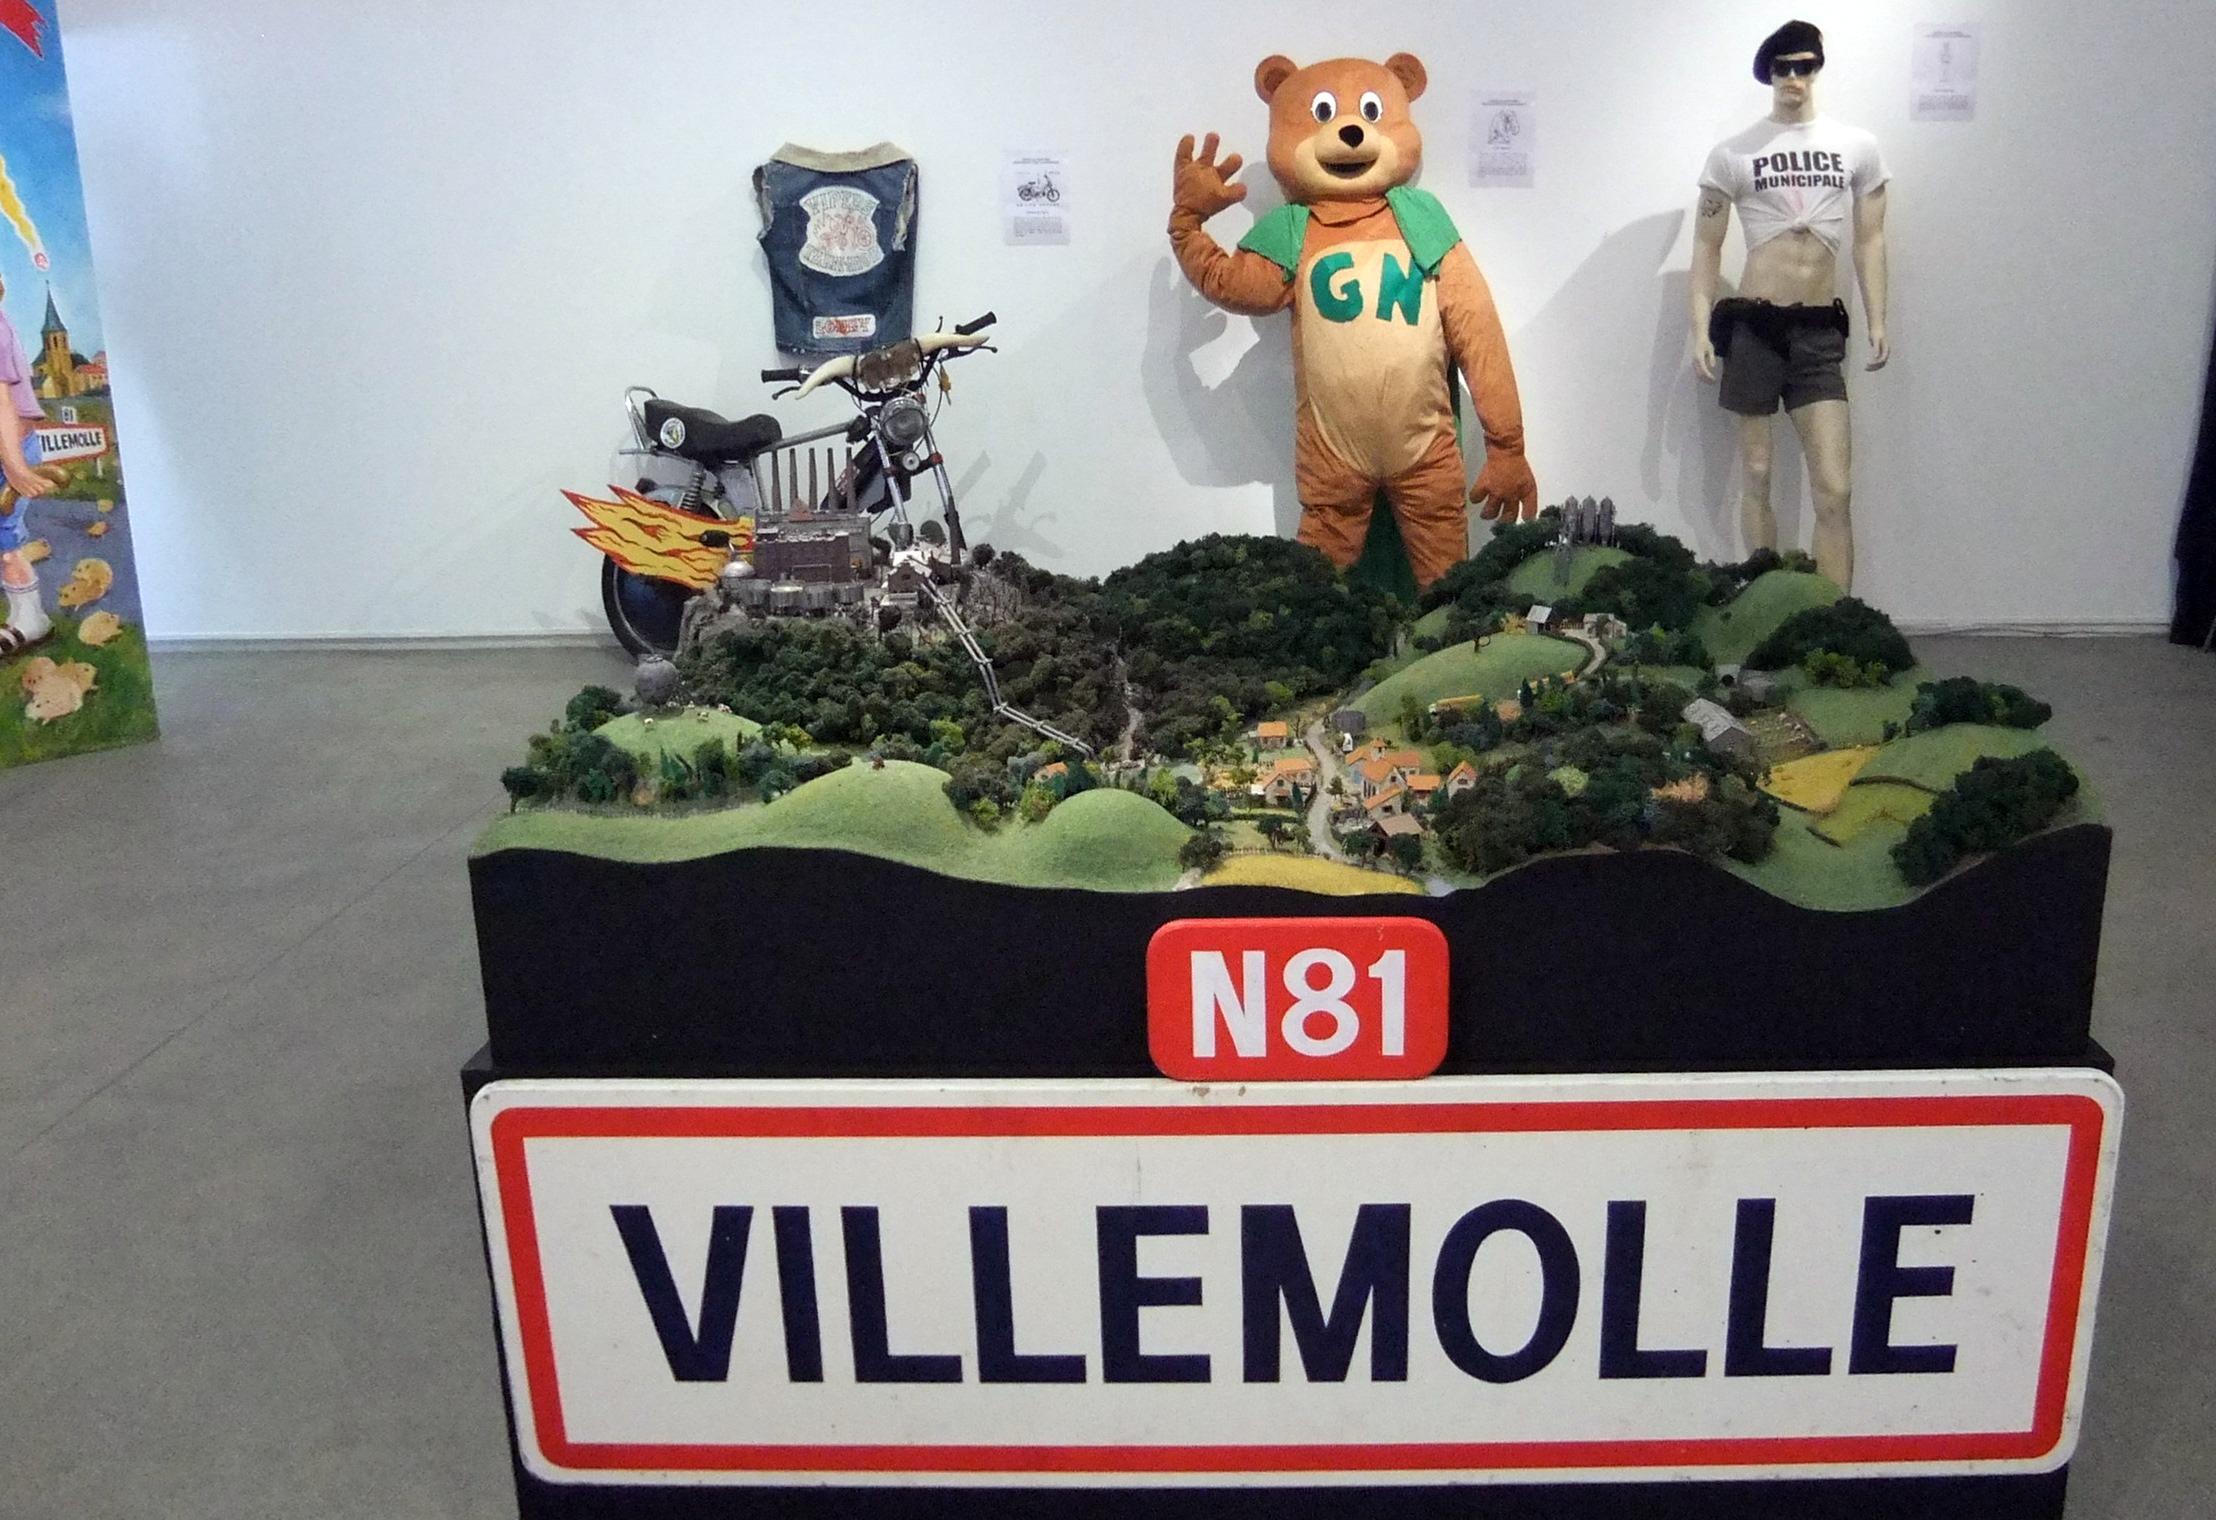 villemolle0487